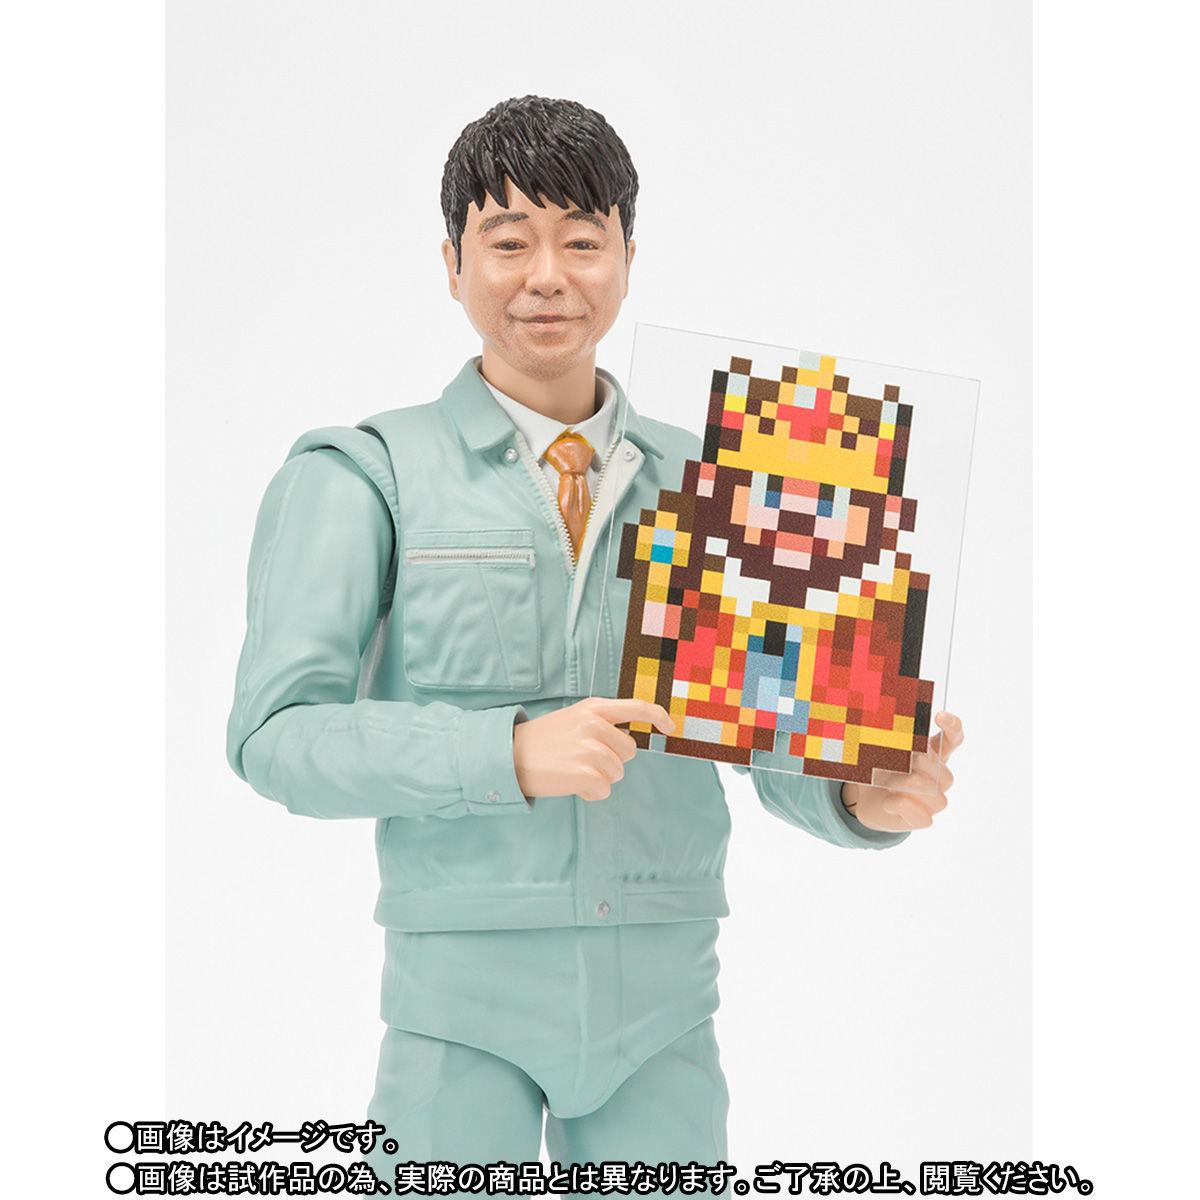 S.H.Figuarts ゲームセンターCX 有野課長(いけそう缶Ver.)-006